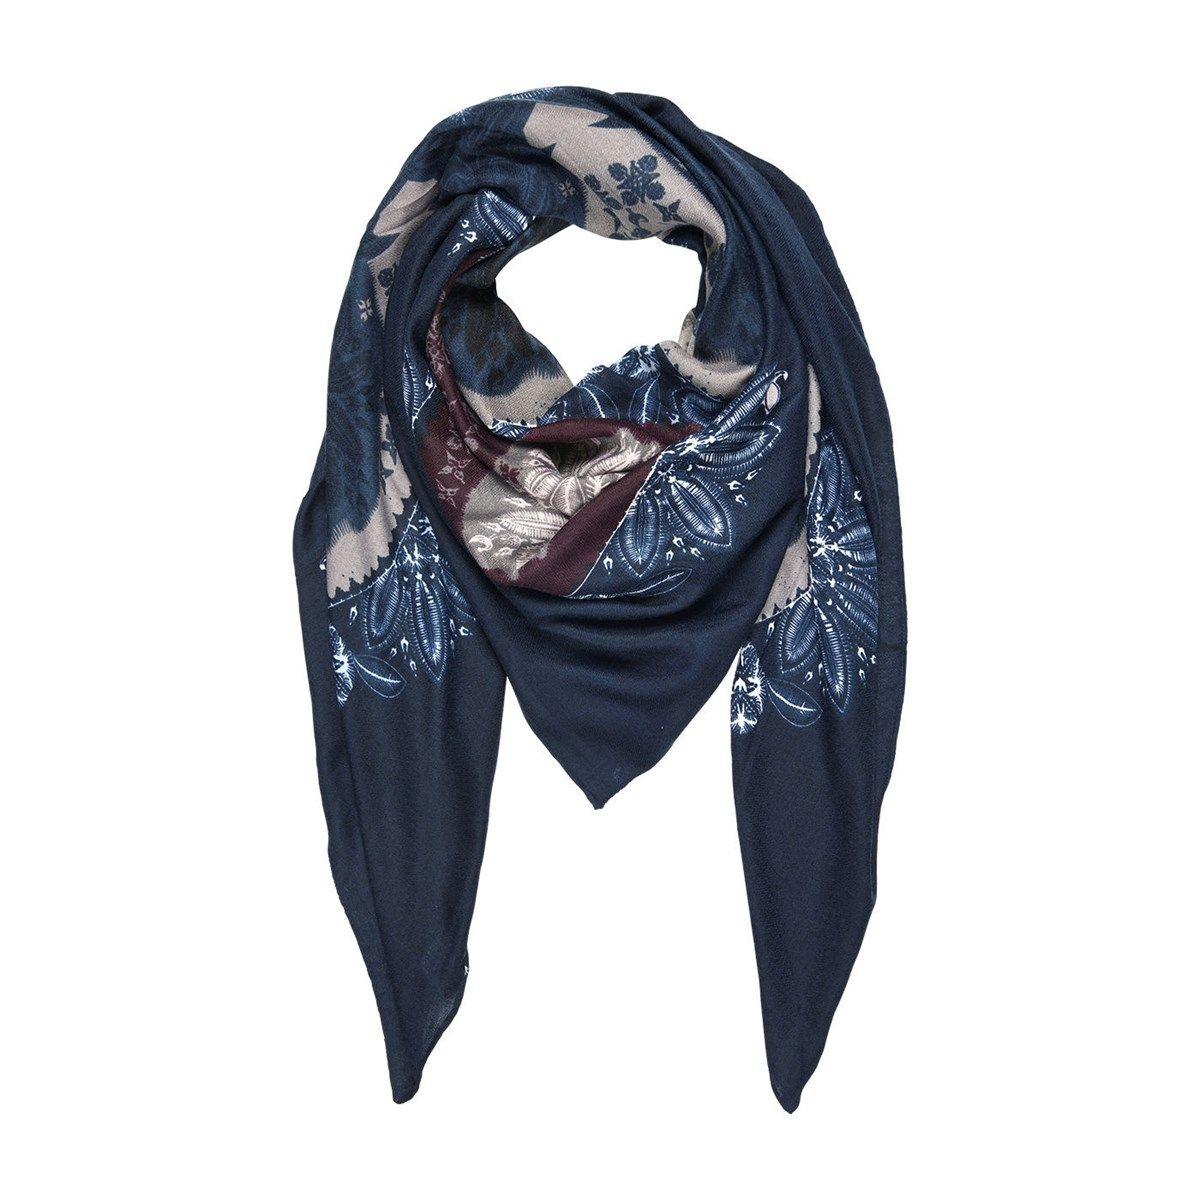 Foulard motif paisley